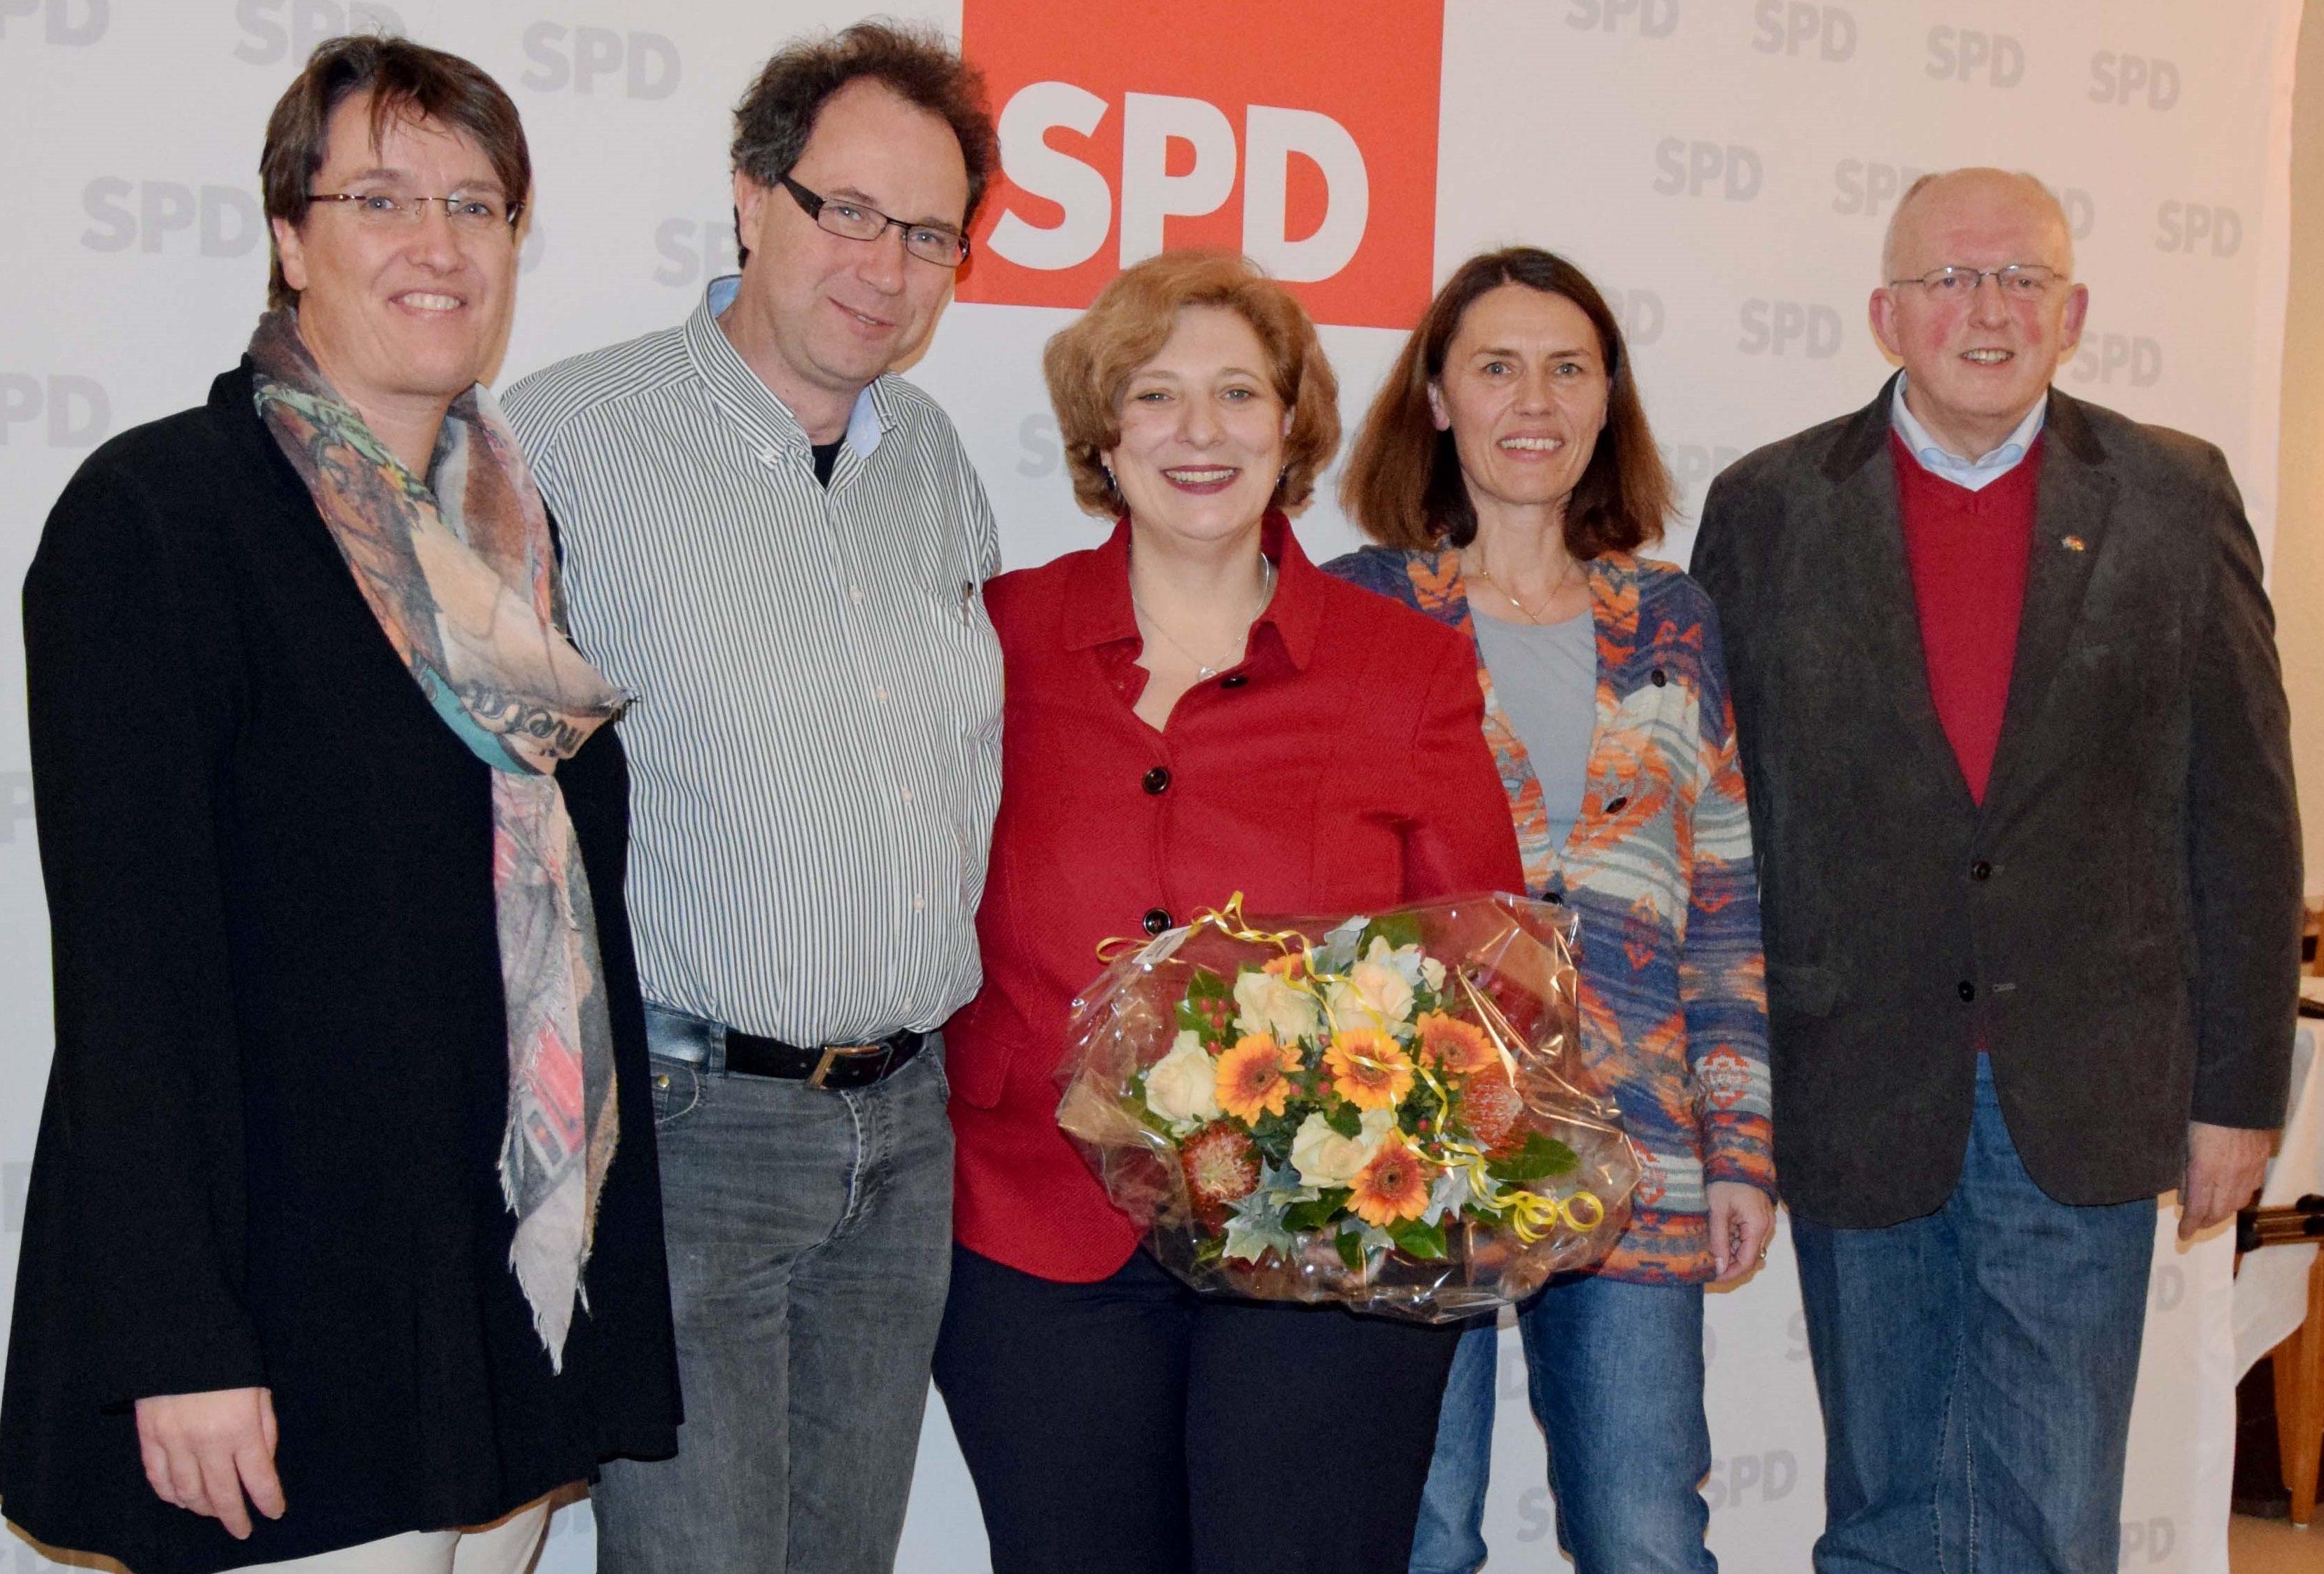 Silvia Pünt-Kohoff, Wolfram De Ridder, Dr. Daniela De Ridder, Andrea Kötter und Gerd Will (v.l.n.r.)